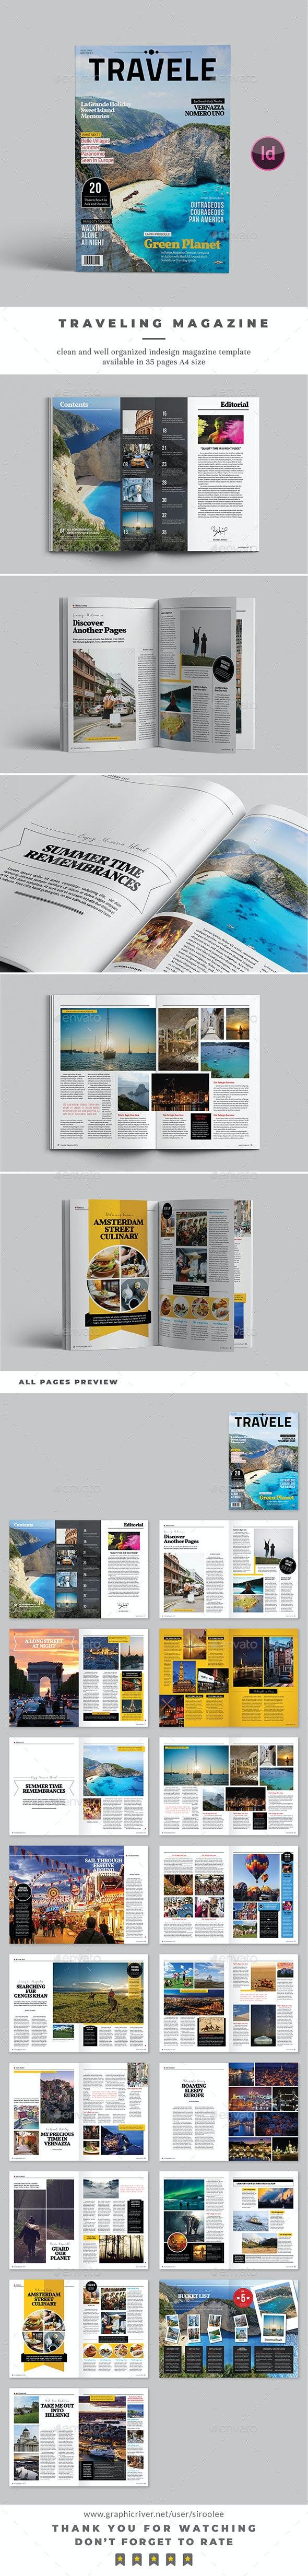 Traveling Magazine Template - Magazines Print Templates